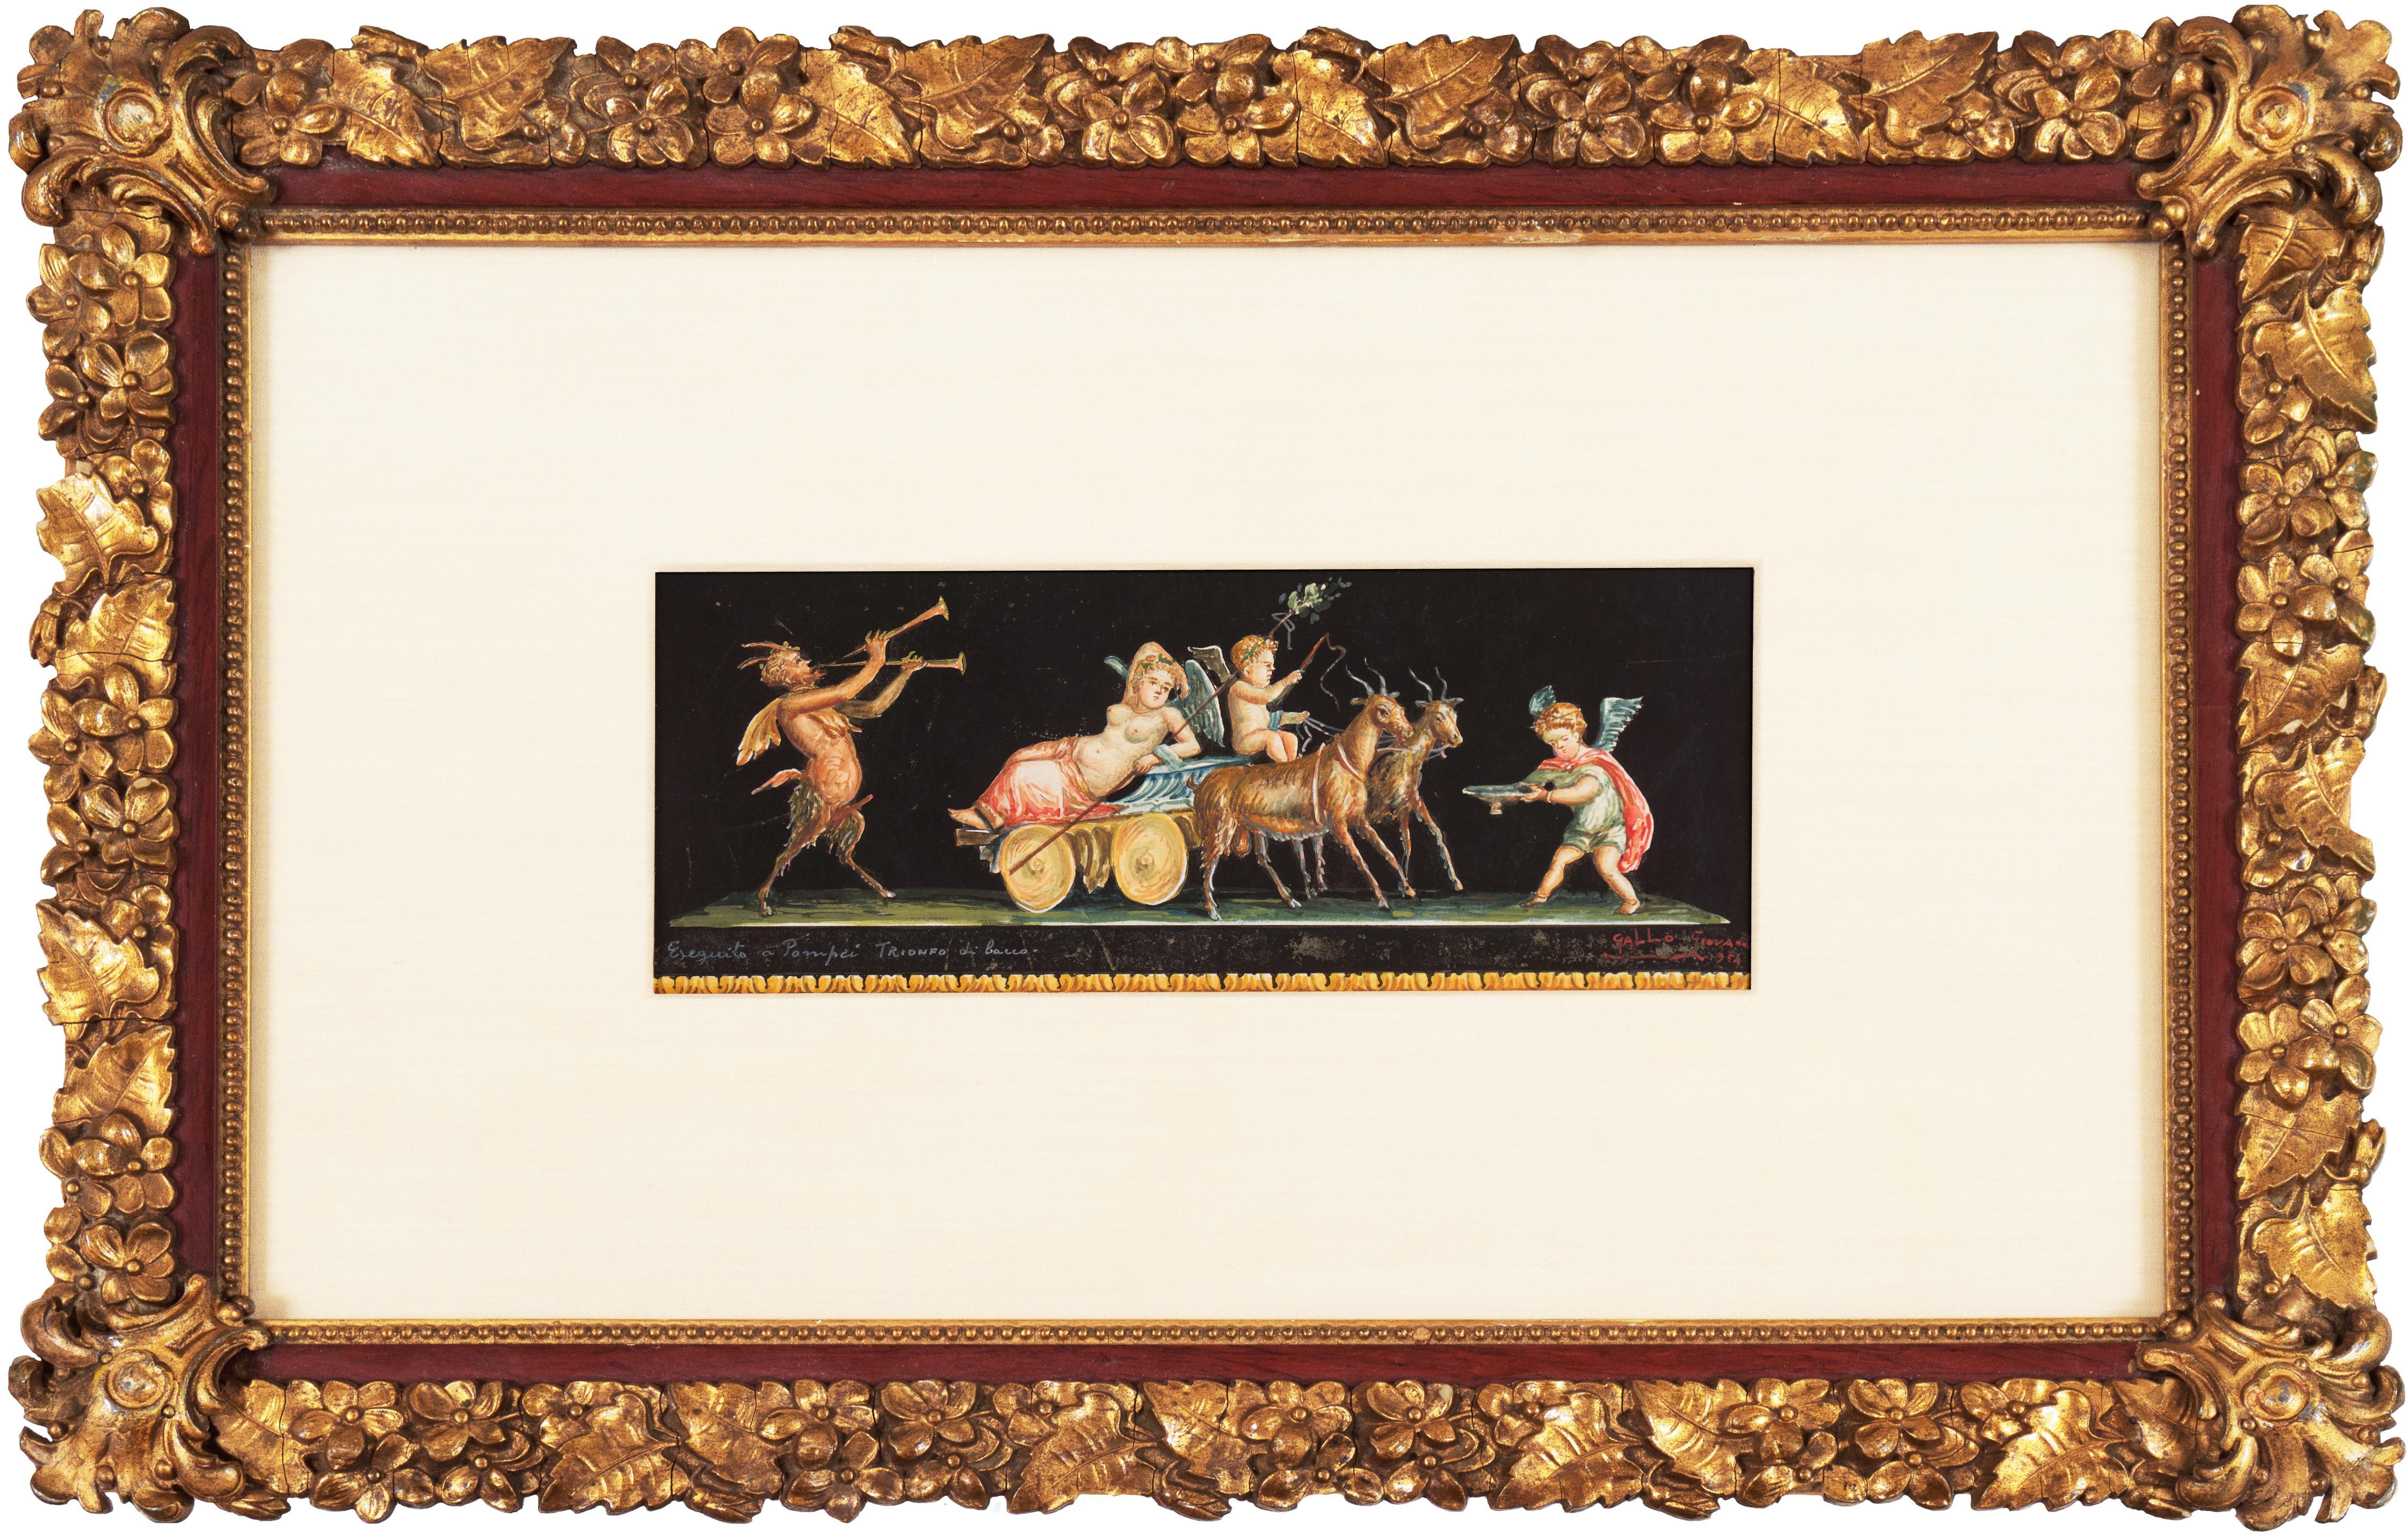 'Bacchanal', Mid-century Pompeii, Roman Mythology, Bacchus, Neo-classical